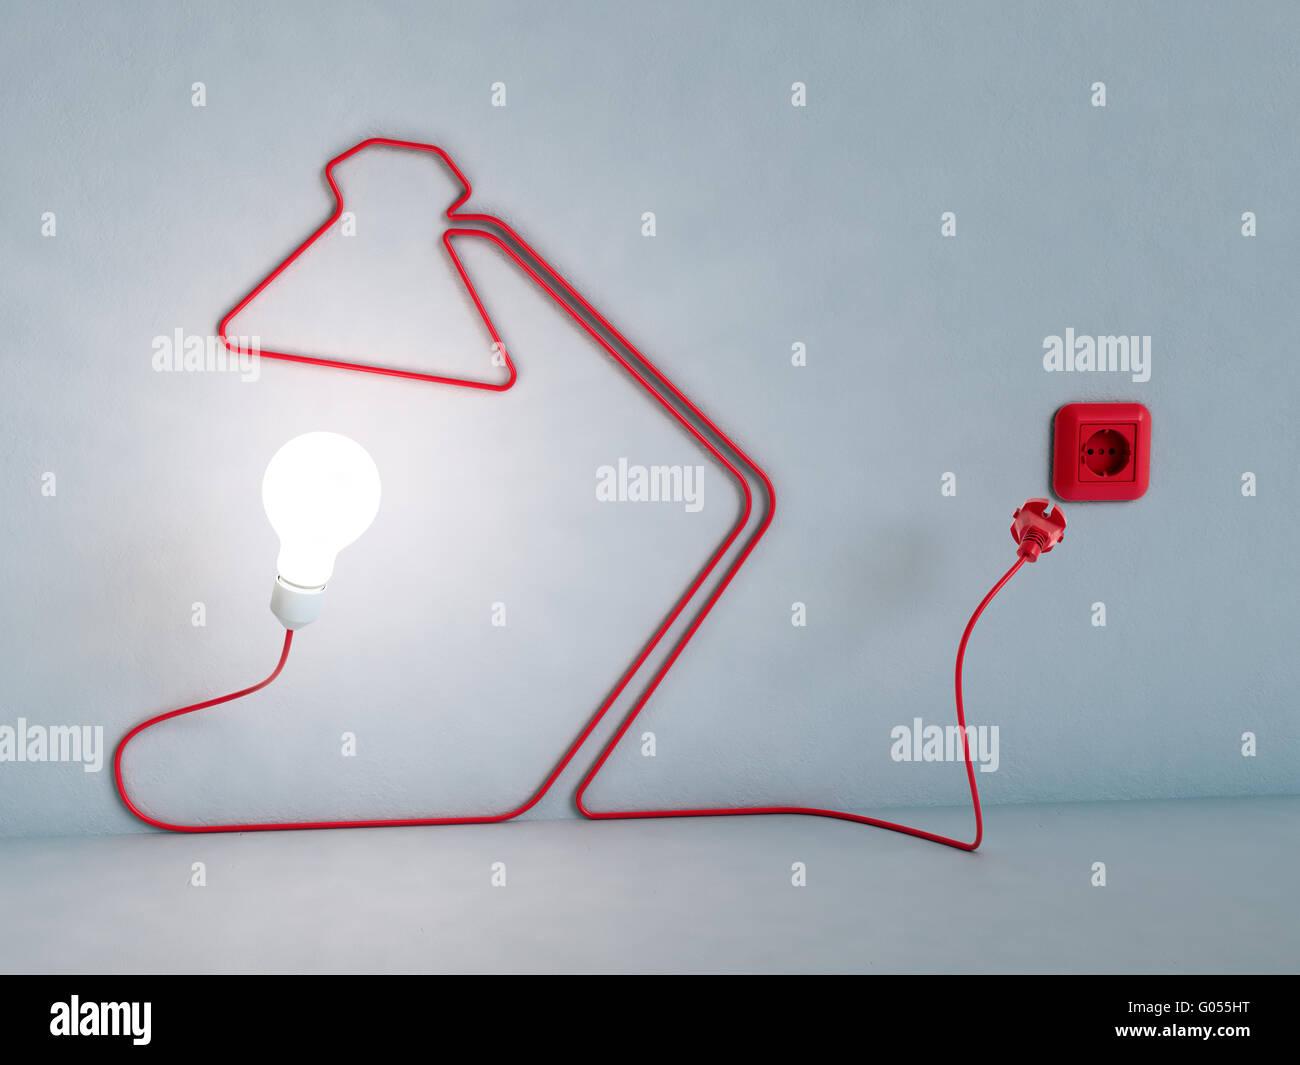 Lampe förmigen Stromkabel - Energie und Kreativität-Konzept Stockbild